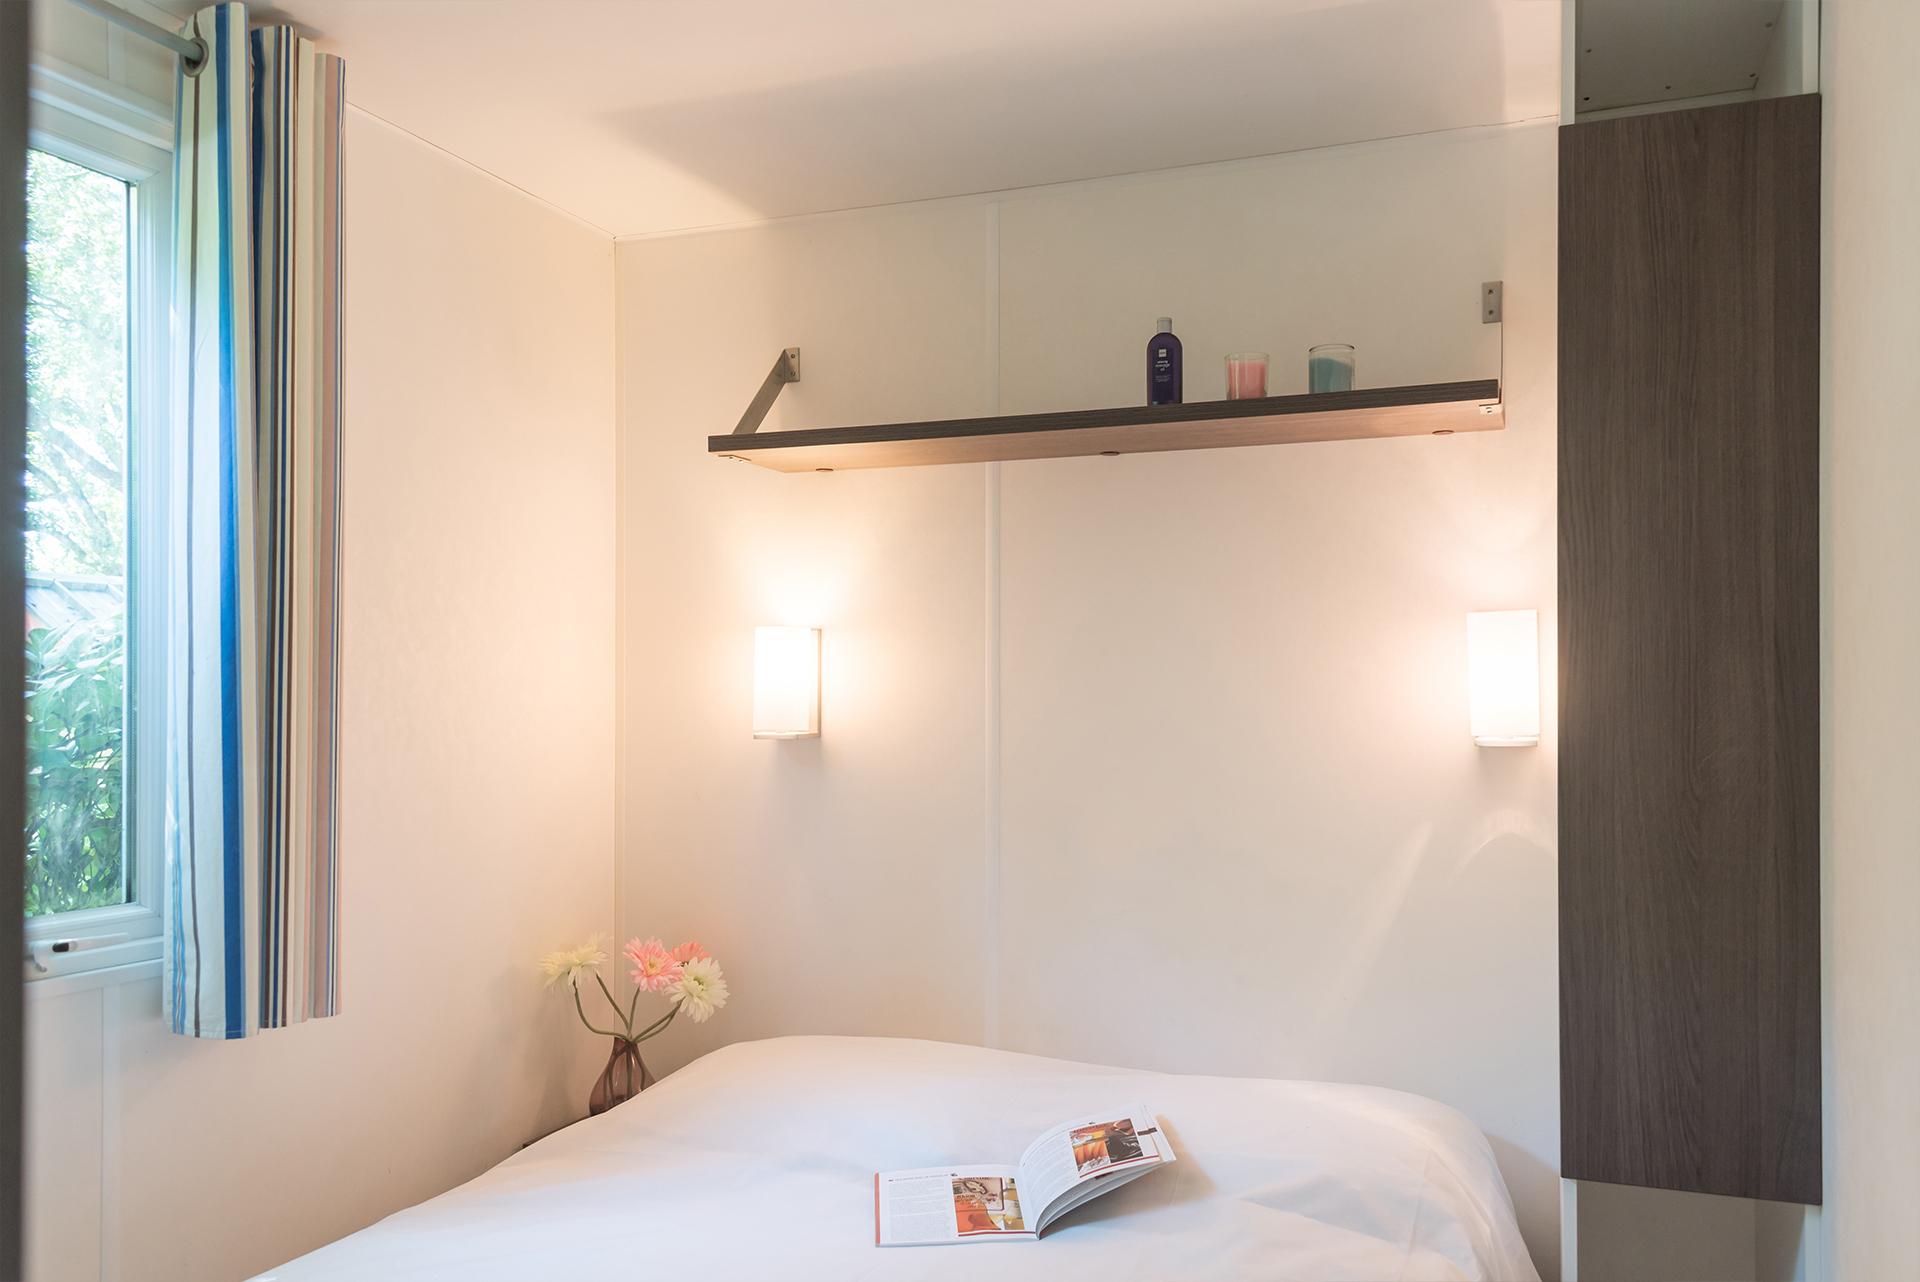 Chambre agréable et lumineuse mobil home Bidart Pays Basque Camping Le Ruisseau